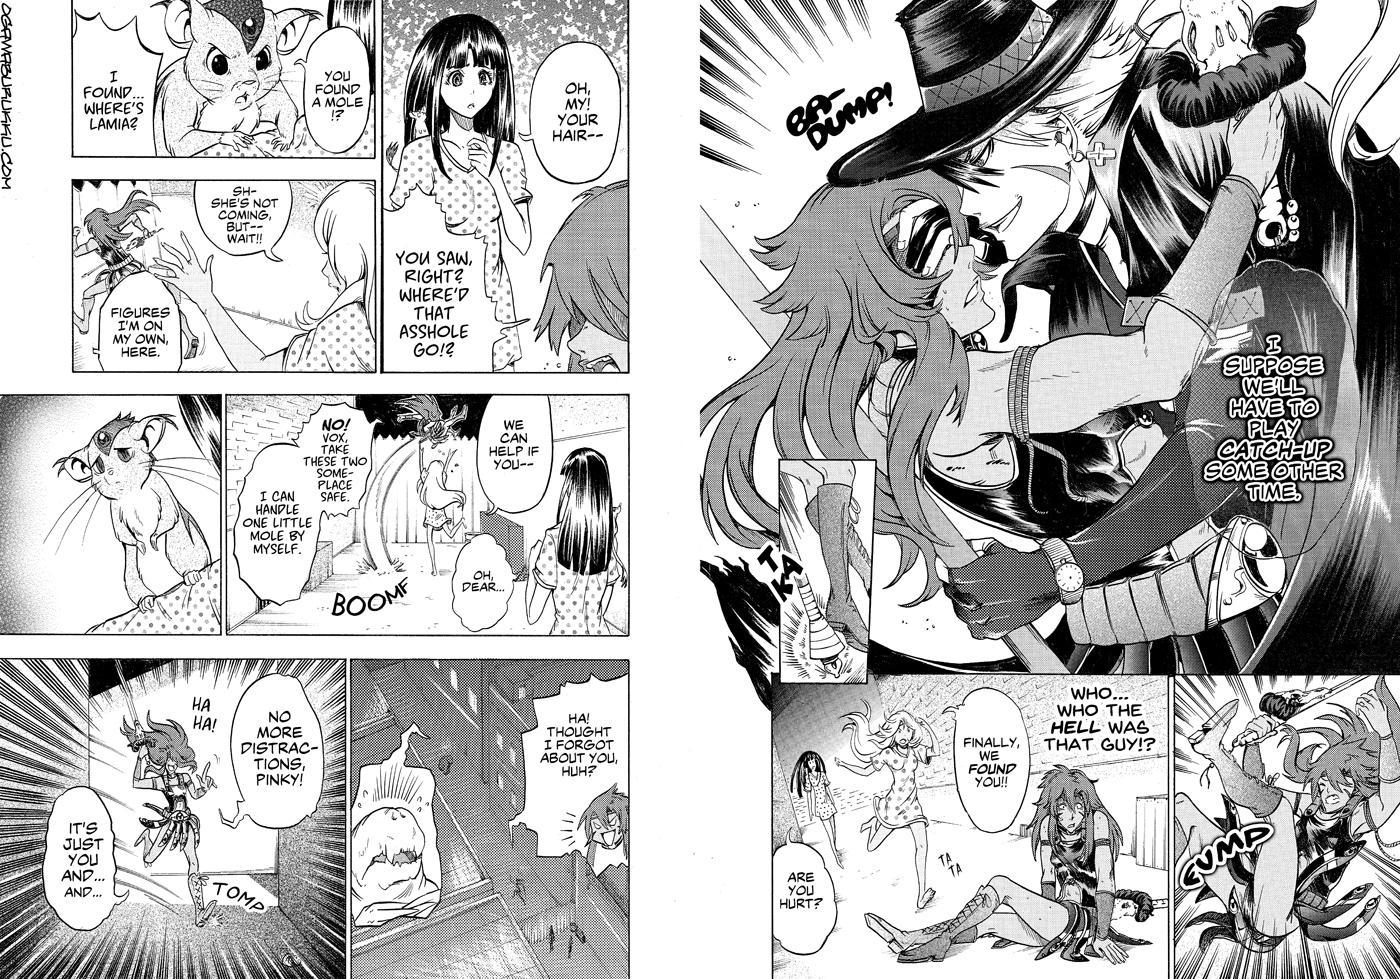 FaLLEN Ch. 7 Pages 8-9 by OgawaBurukku